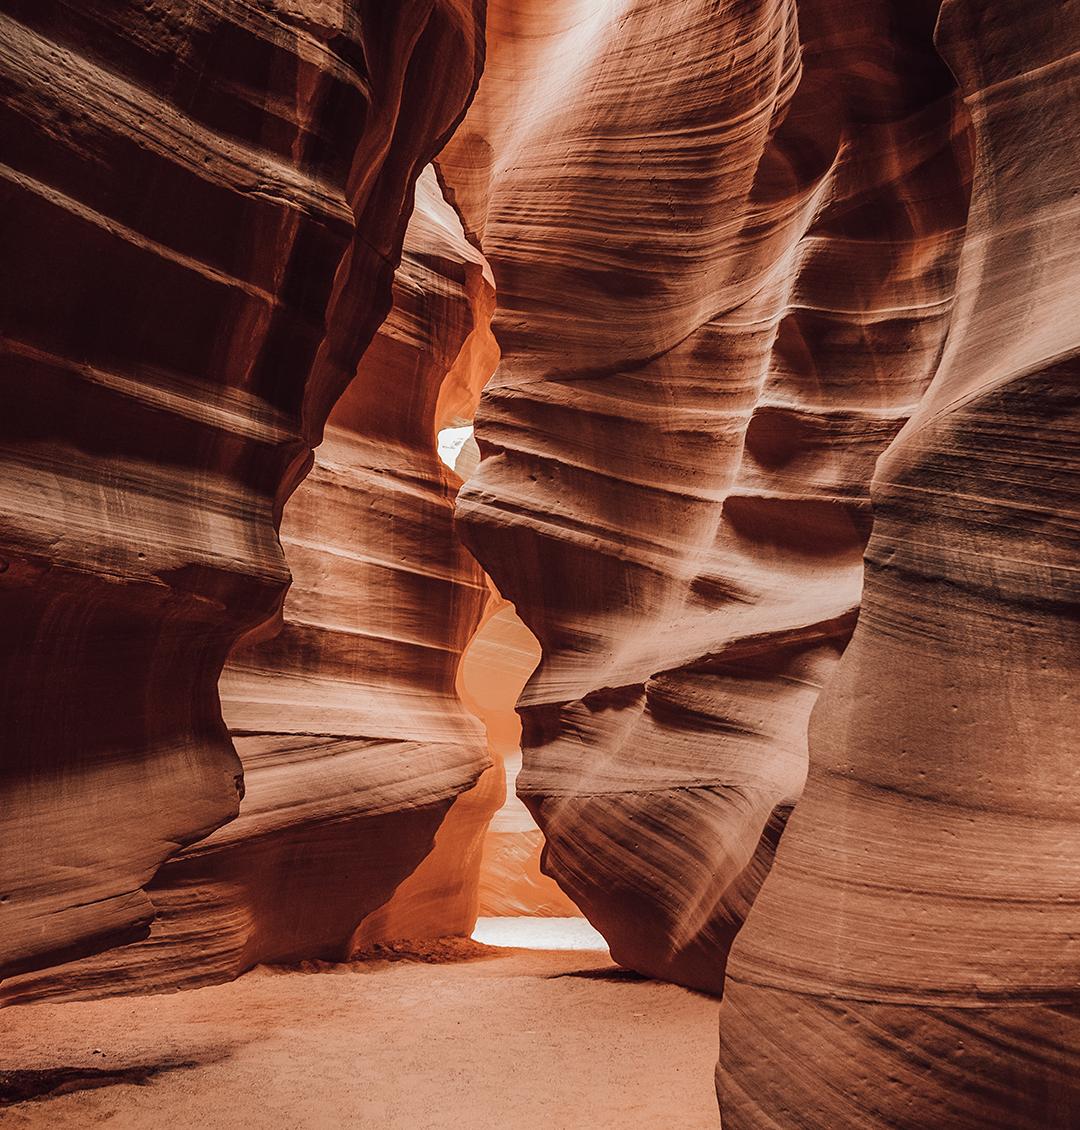 Desert Canyon Lightroom Presets For Desktop Mobile By Wilde Presets Earth Tone Wall Art Aesthetic Images Boho Aesthetic